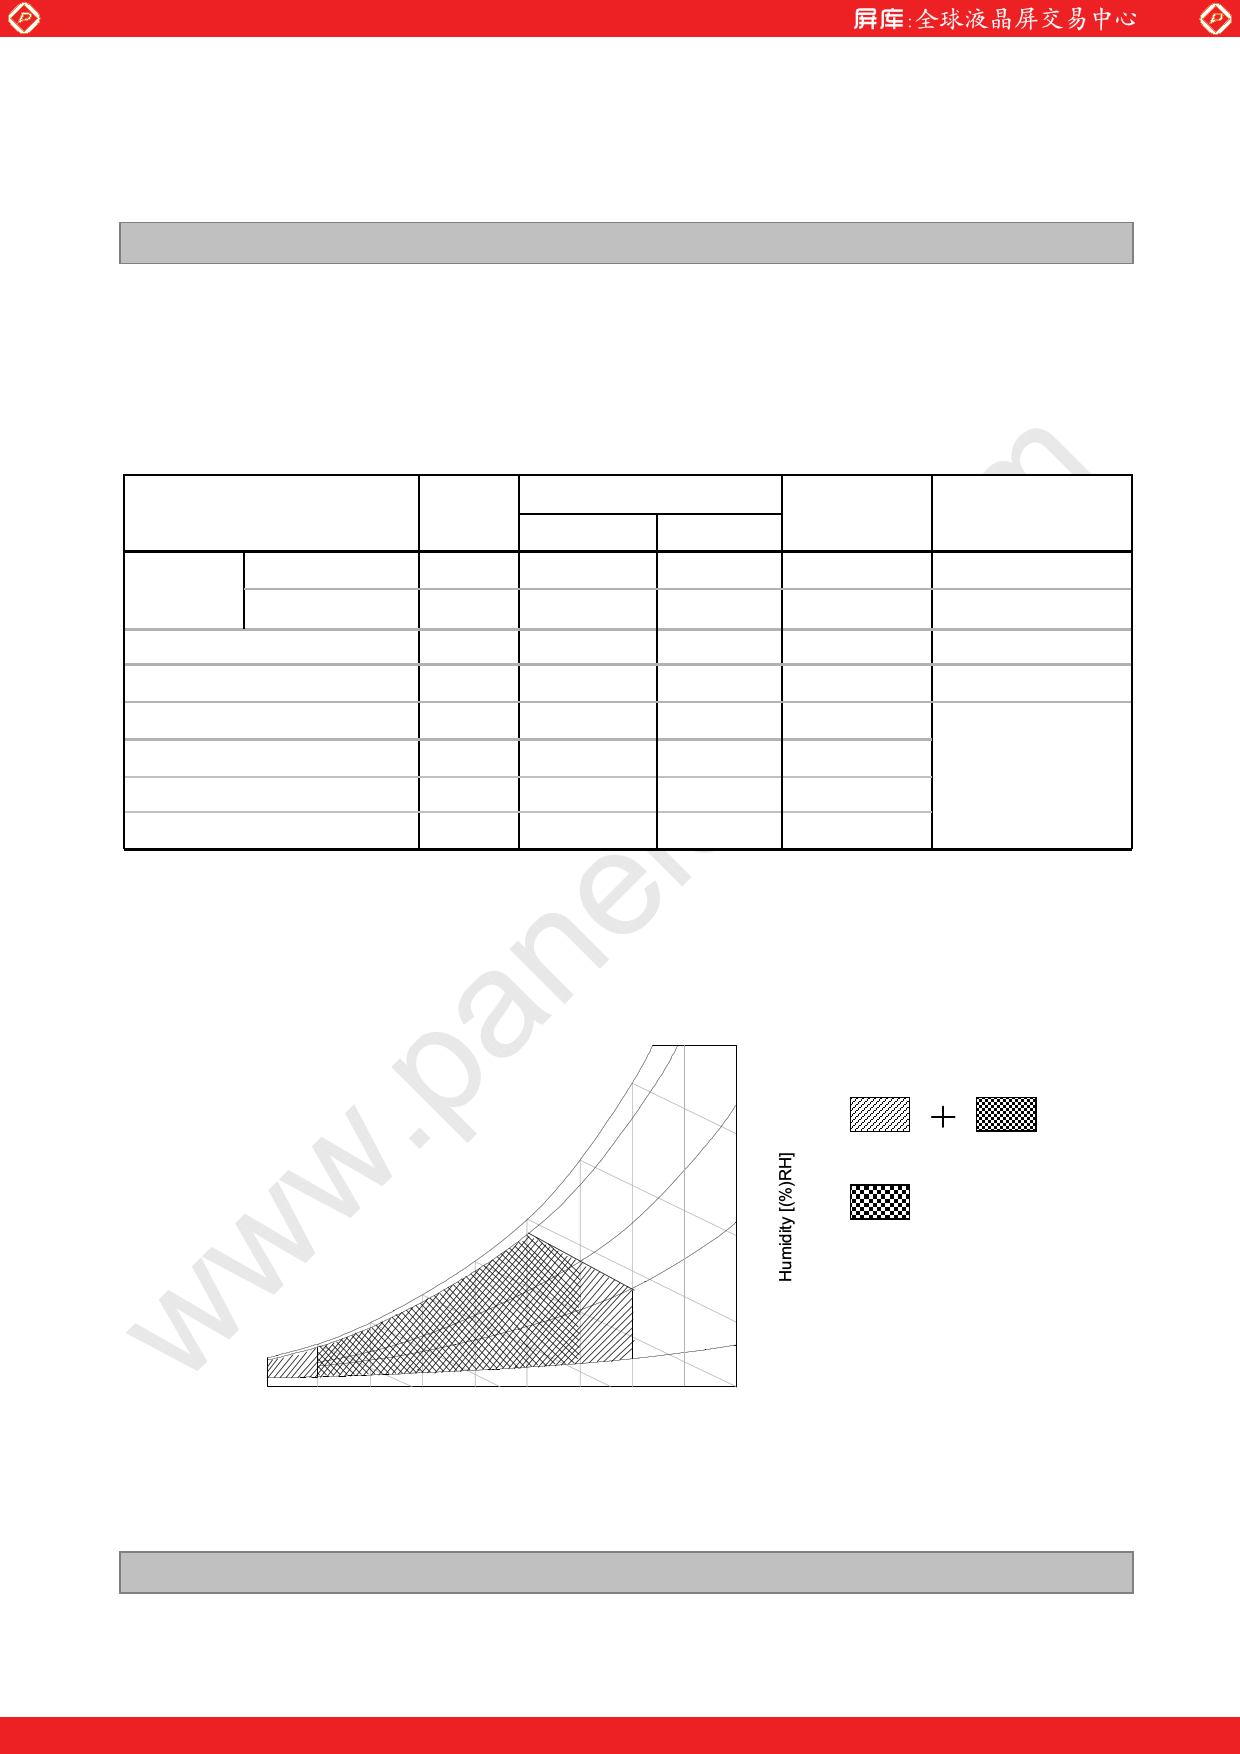 LC320WUN-SAB4 pdf